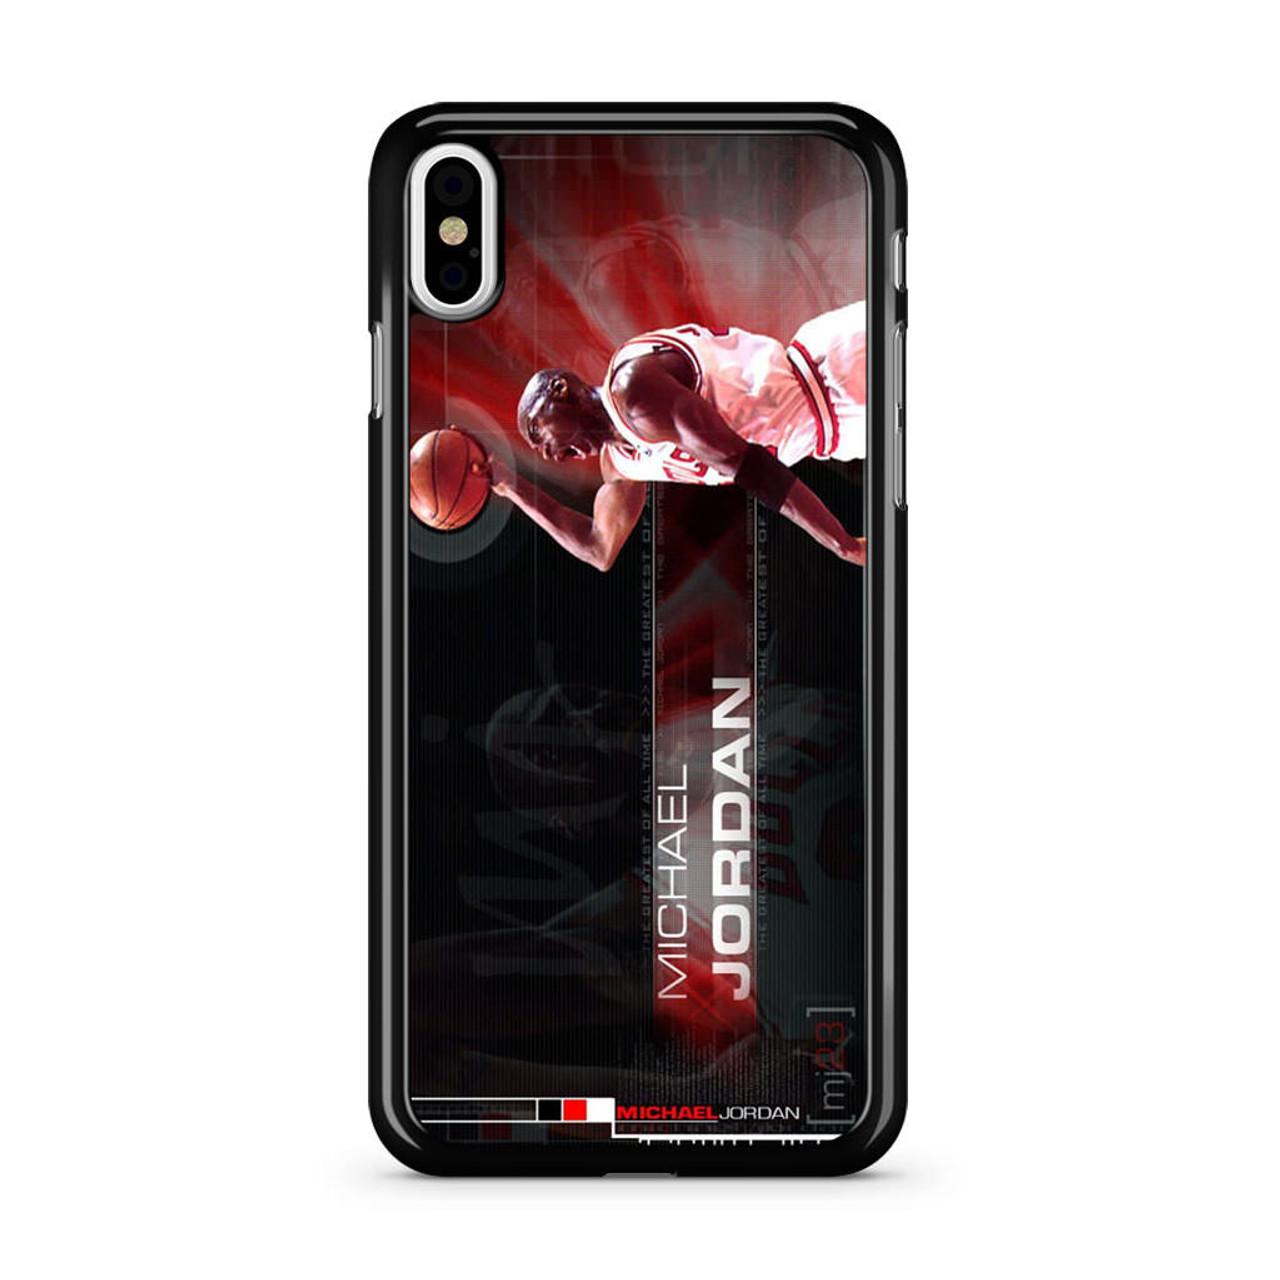 brand new 062ea e7dc8 Michael Jordan NBA Legend iPhone X Case